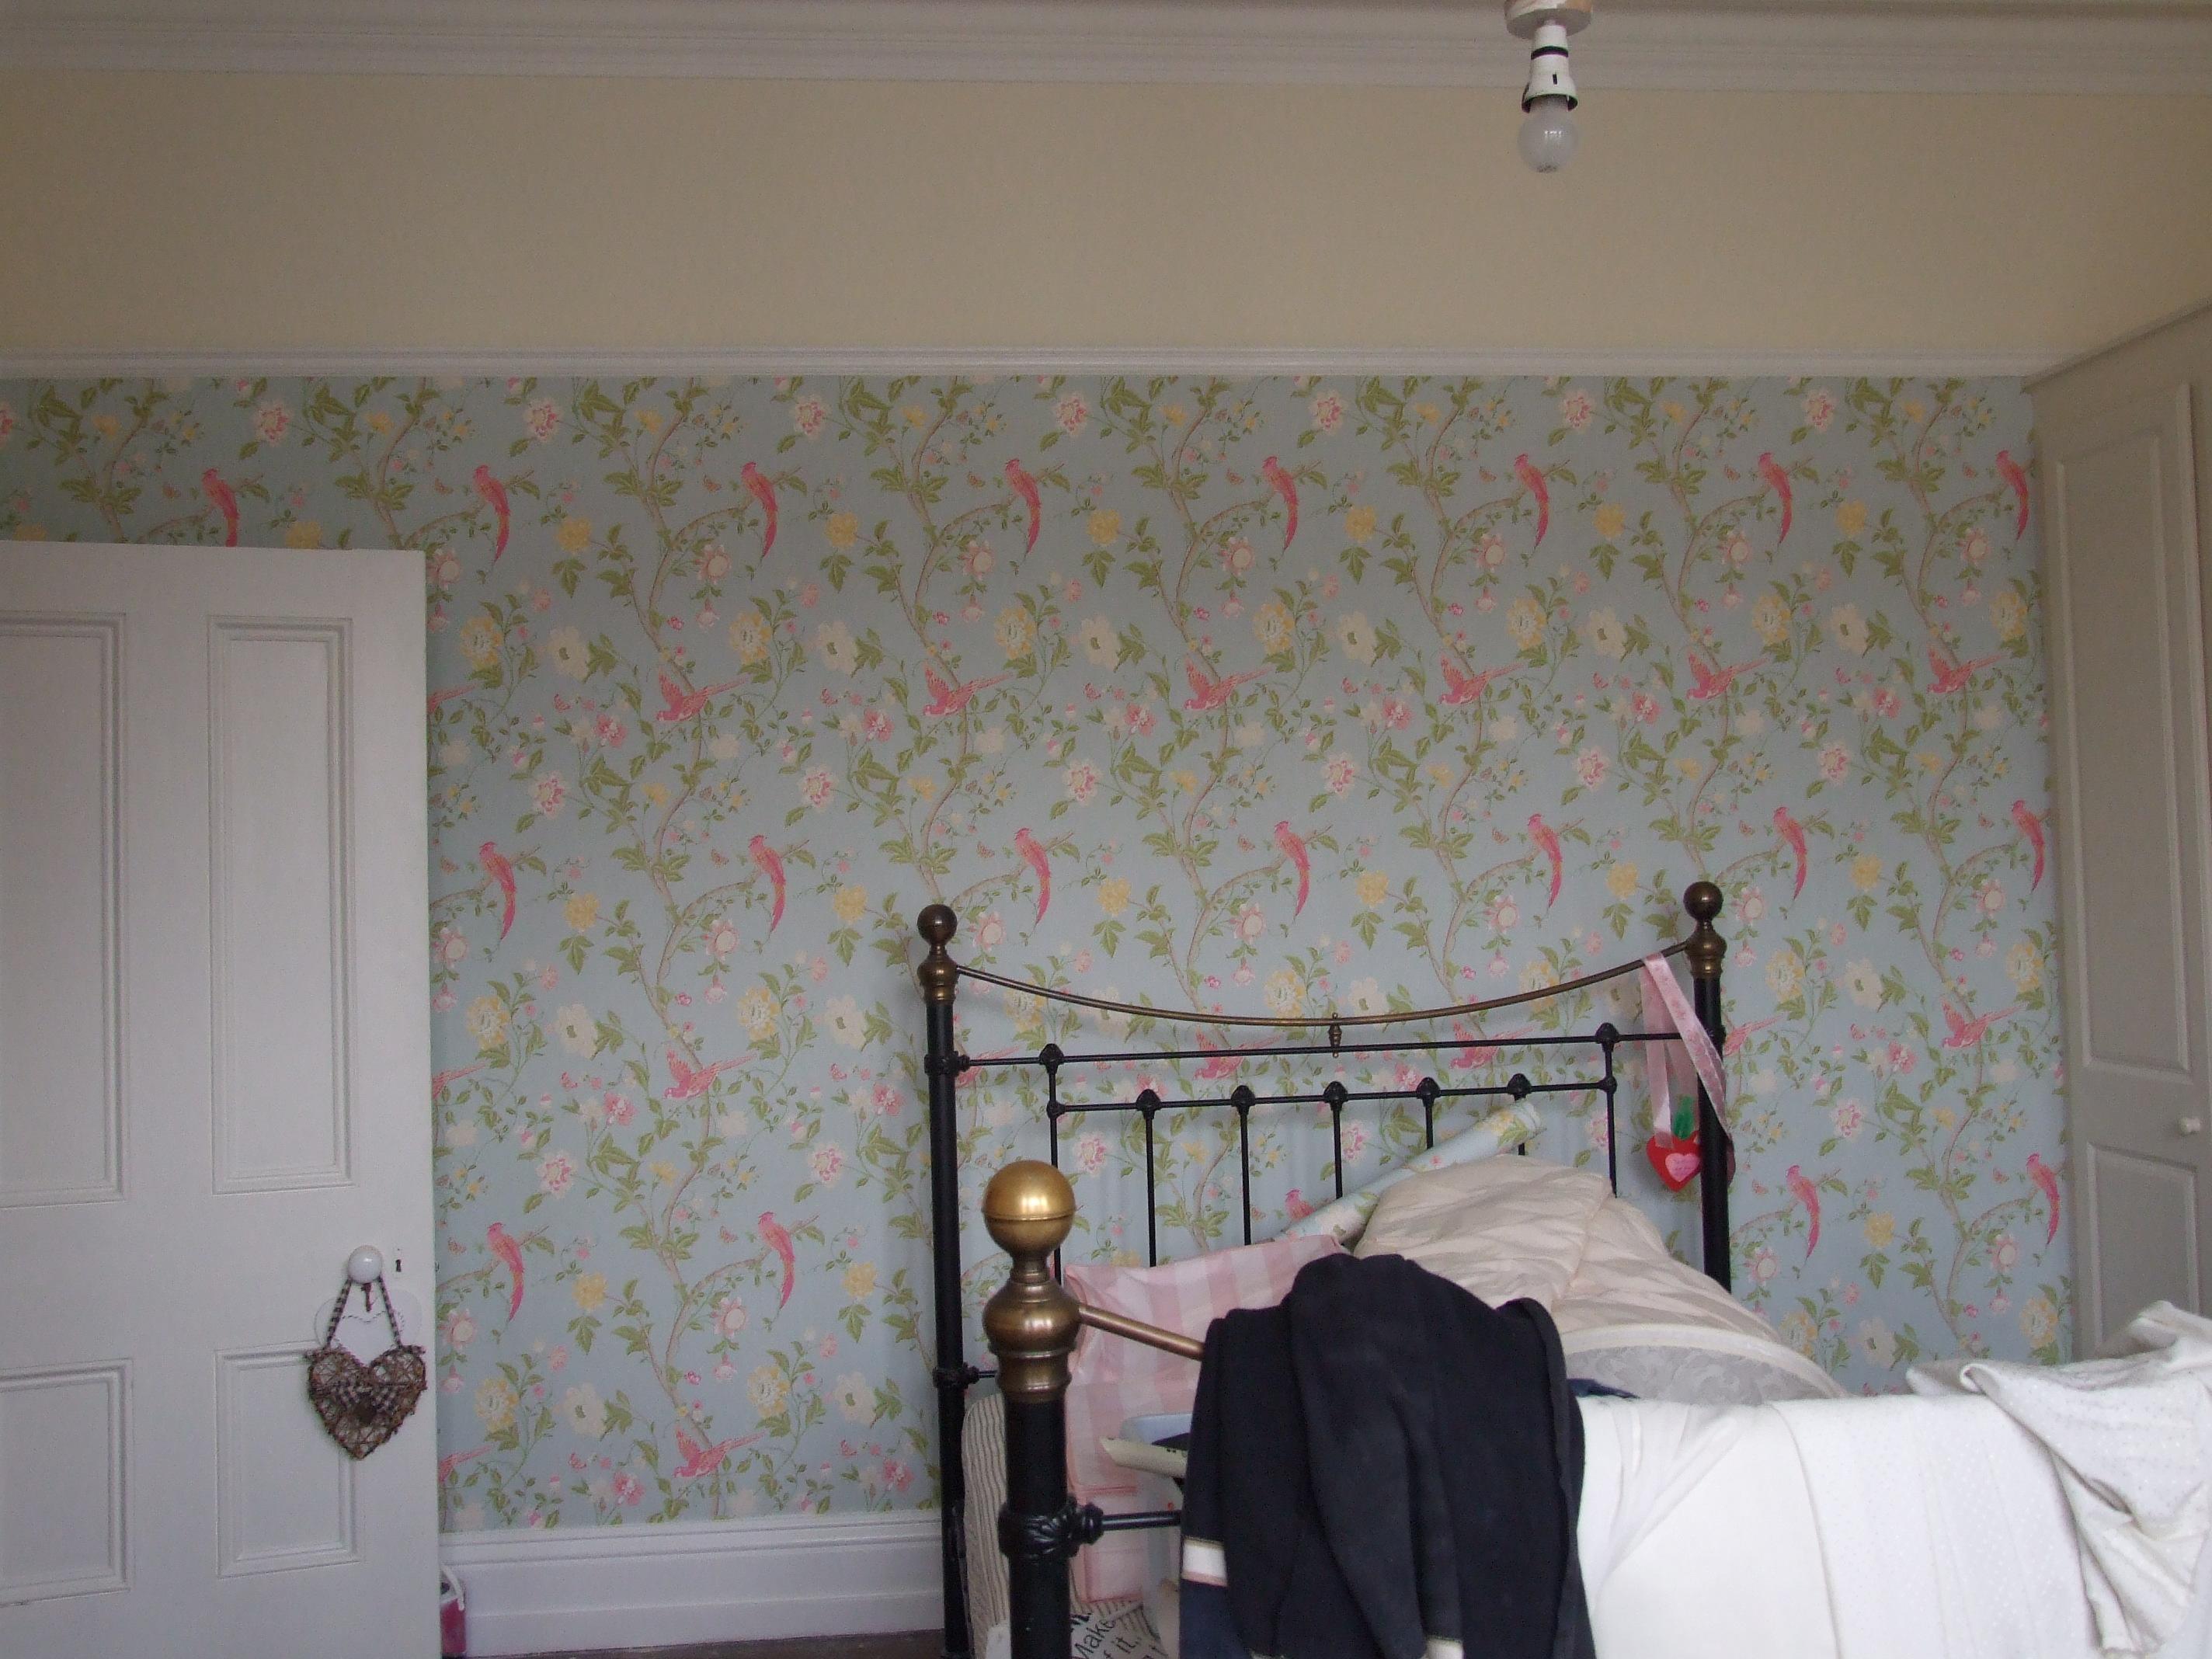 Free download Bedroom wallpaper homebase dscf8 [8x8] for